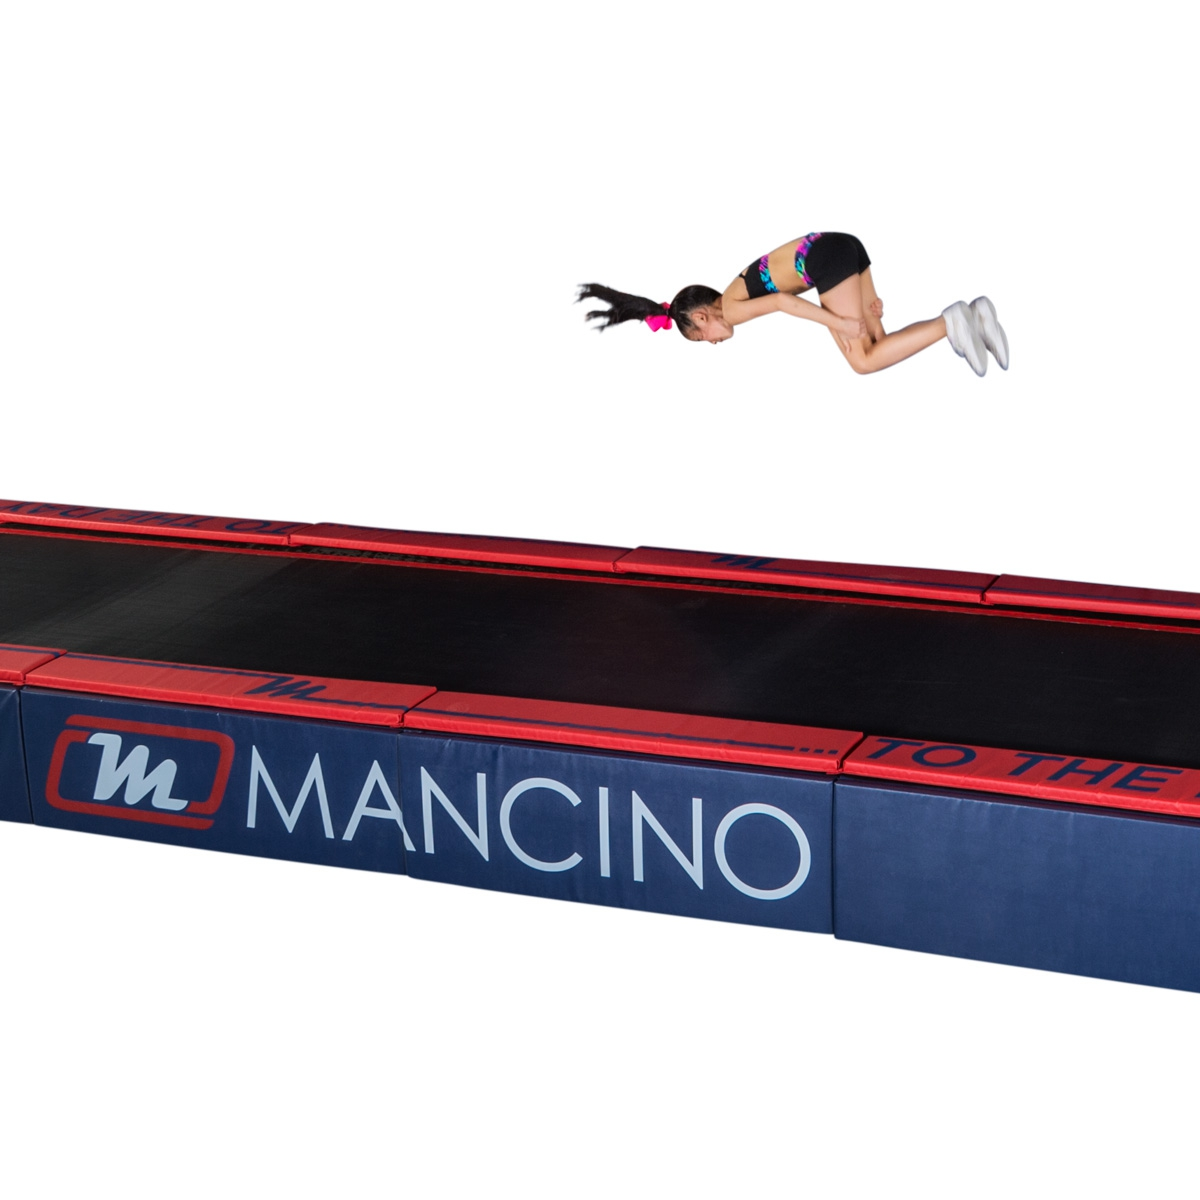 mancino mats cheerleader on tumbl trak with side skirt pads - Tumbl Trak Padded Side Skirt Panels | Cheer | Mancino Mats